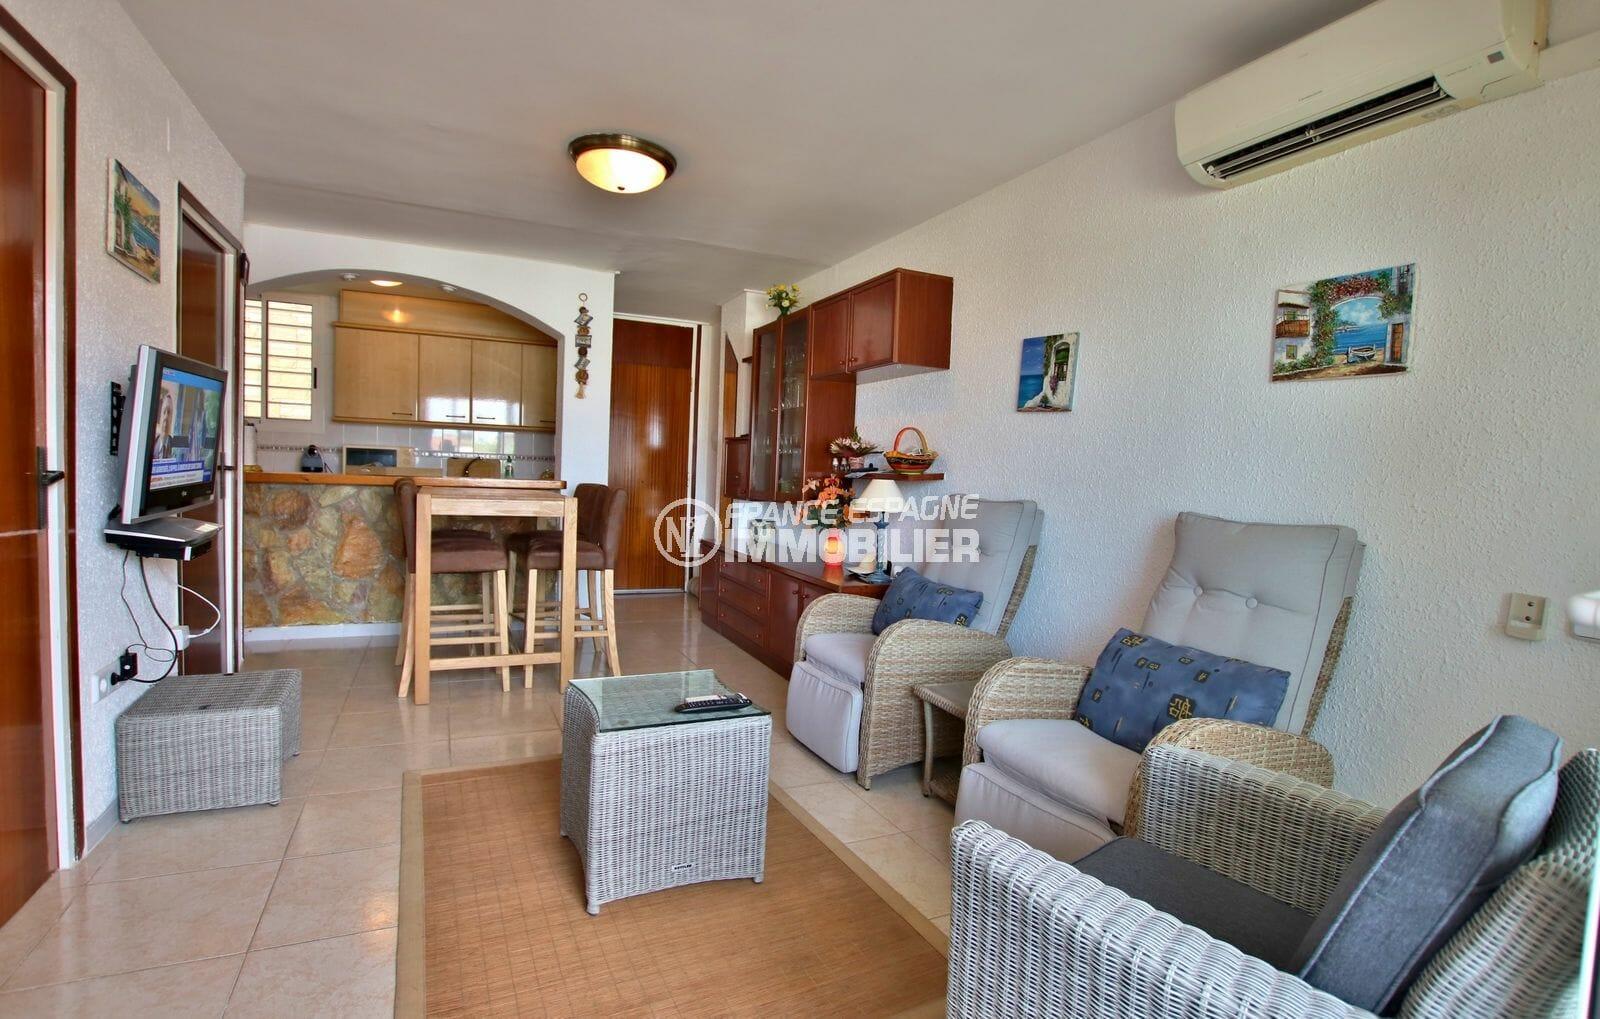 agence immobilière costa brava: appartement 45 m², salon / séjour avec cuisine semi ouverte